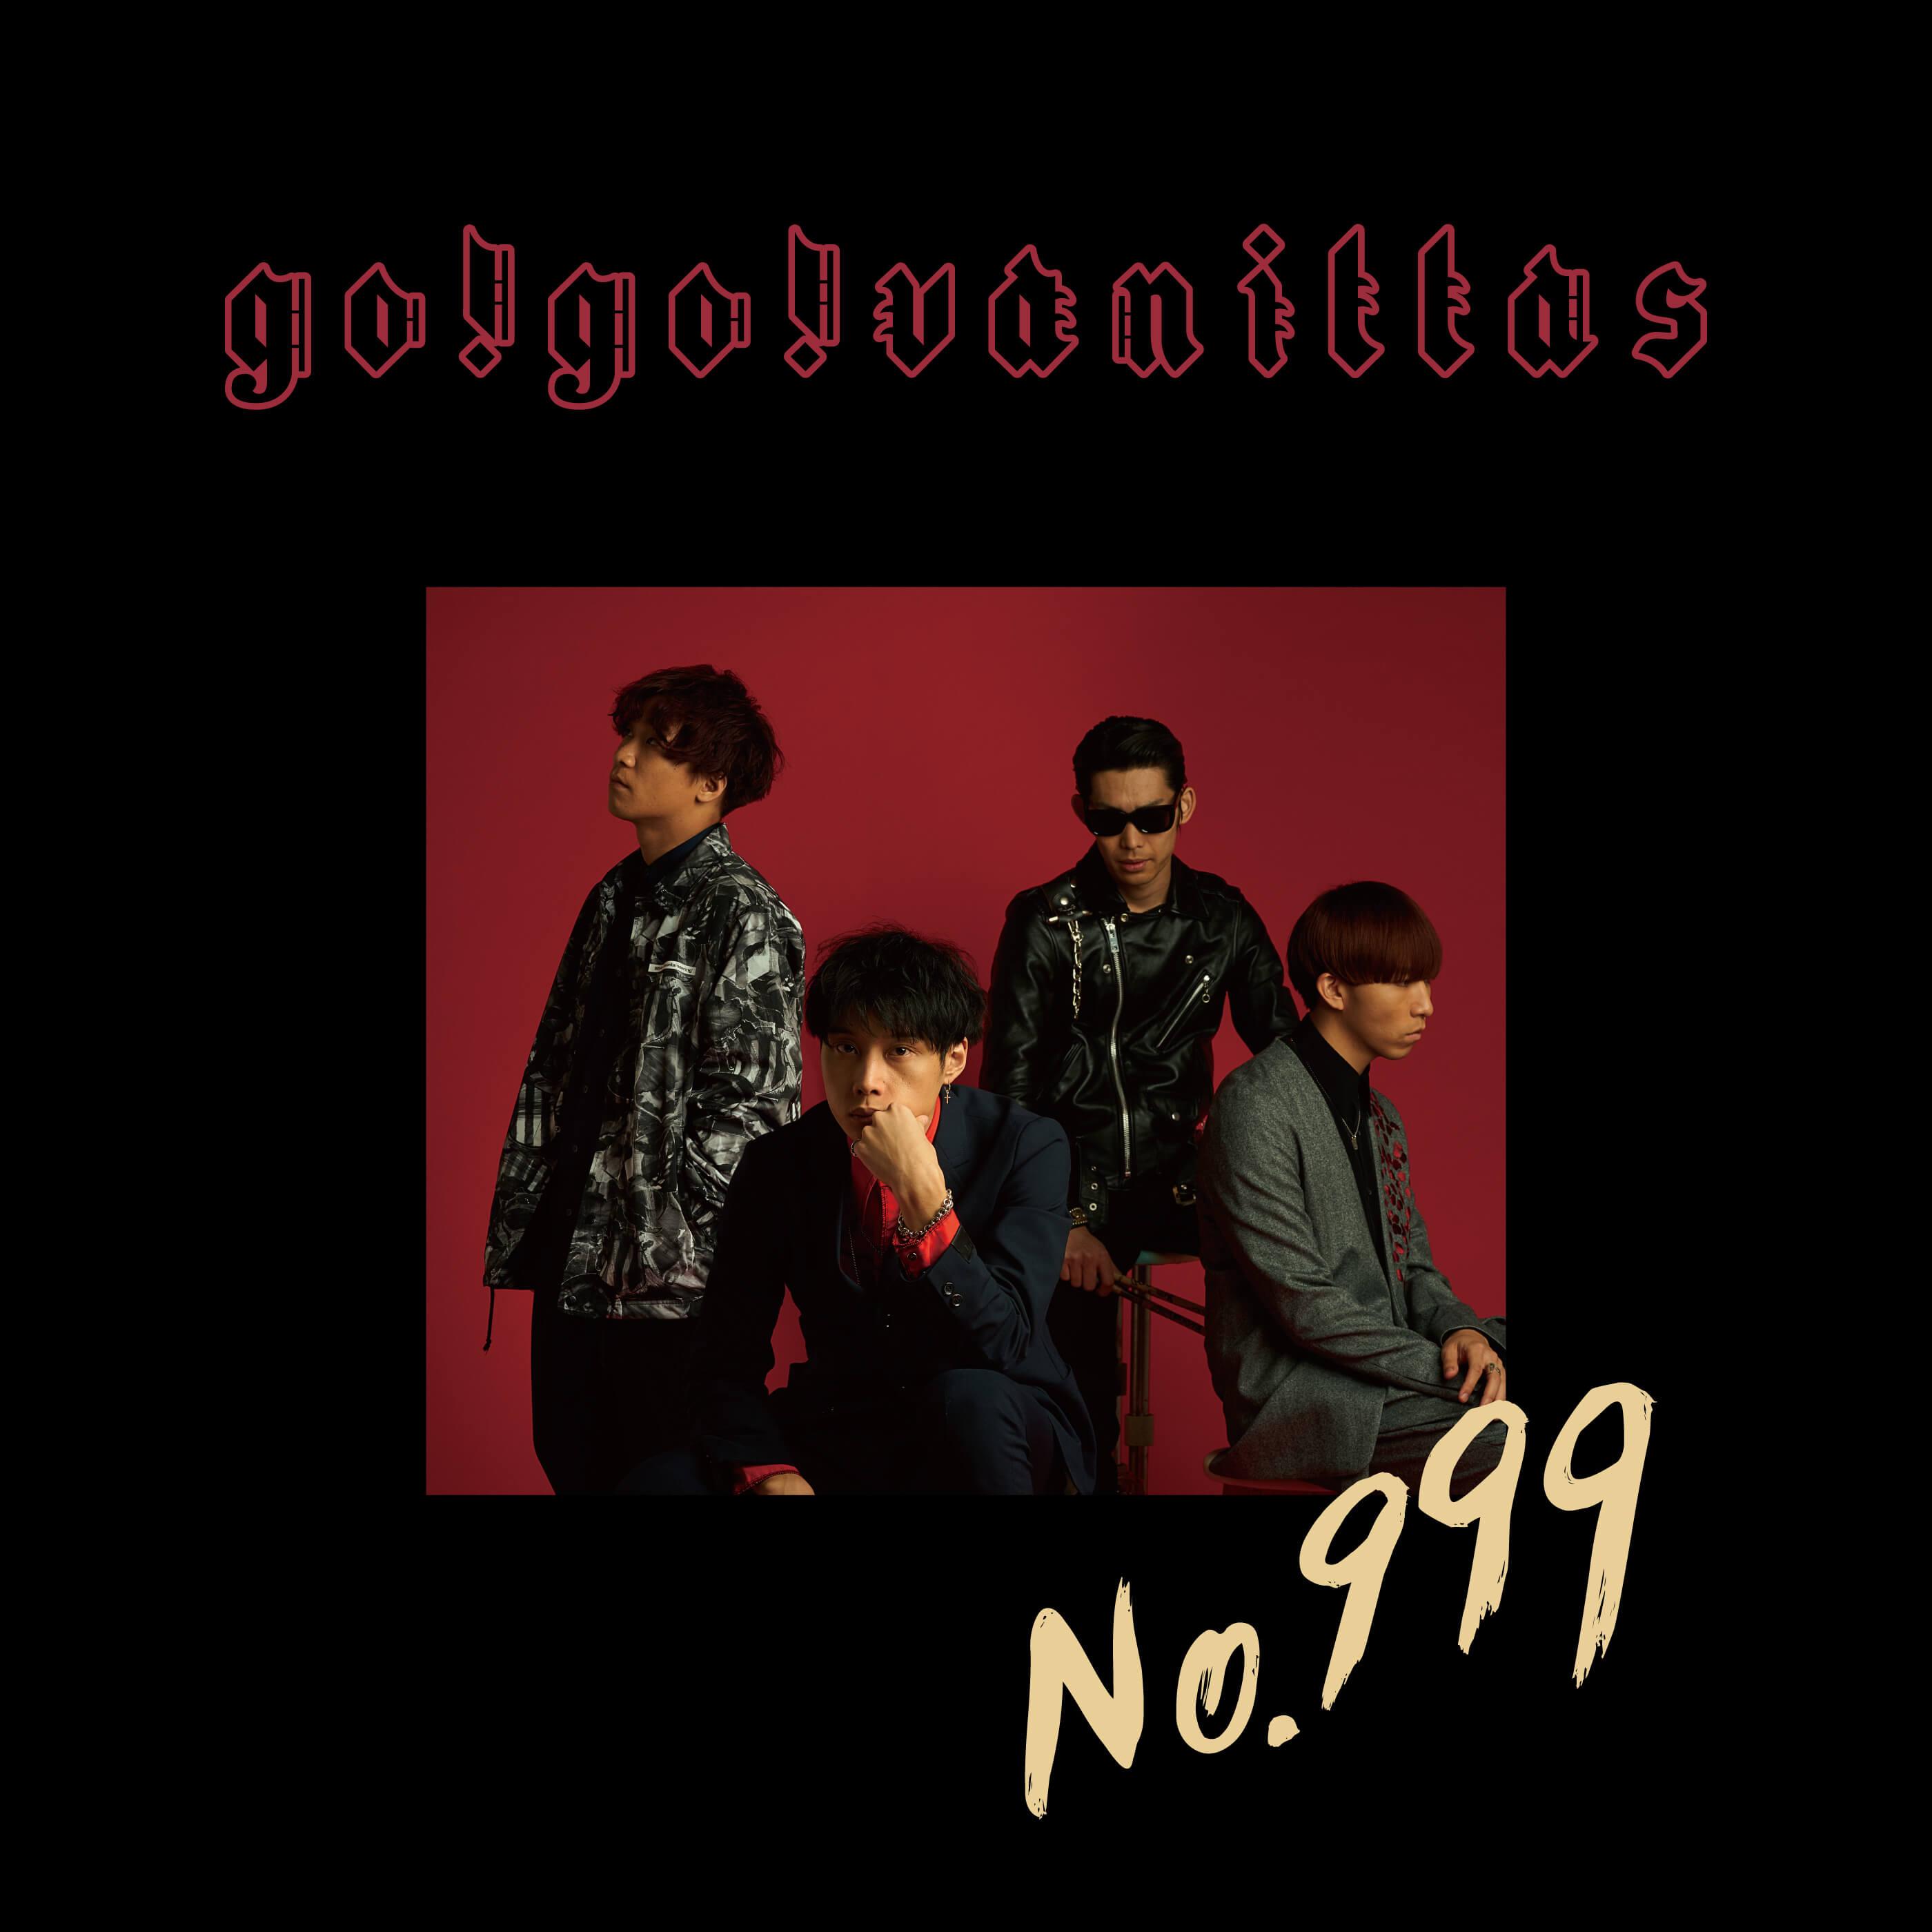 go!go!vanillas ニューシングル「No.999」 MV&音源の先行配信スタート